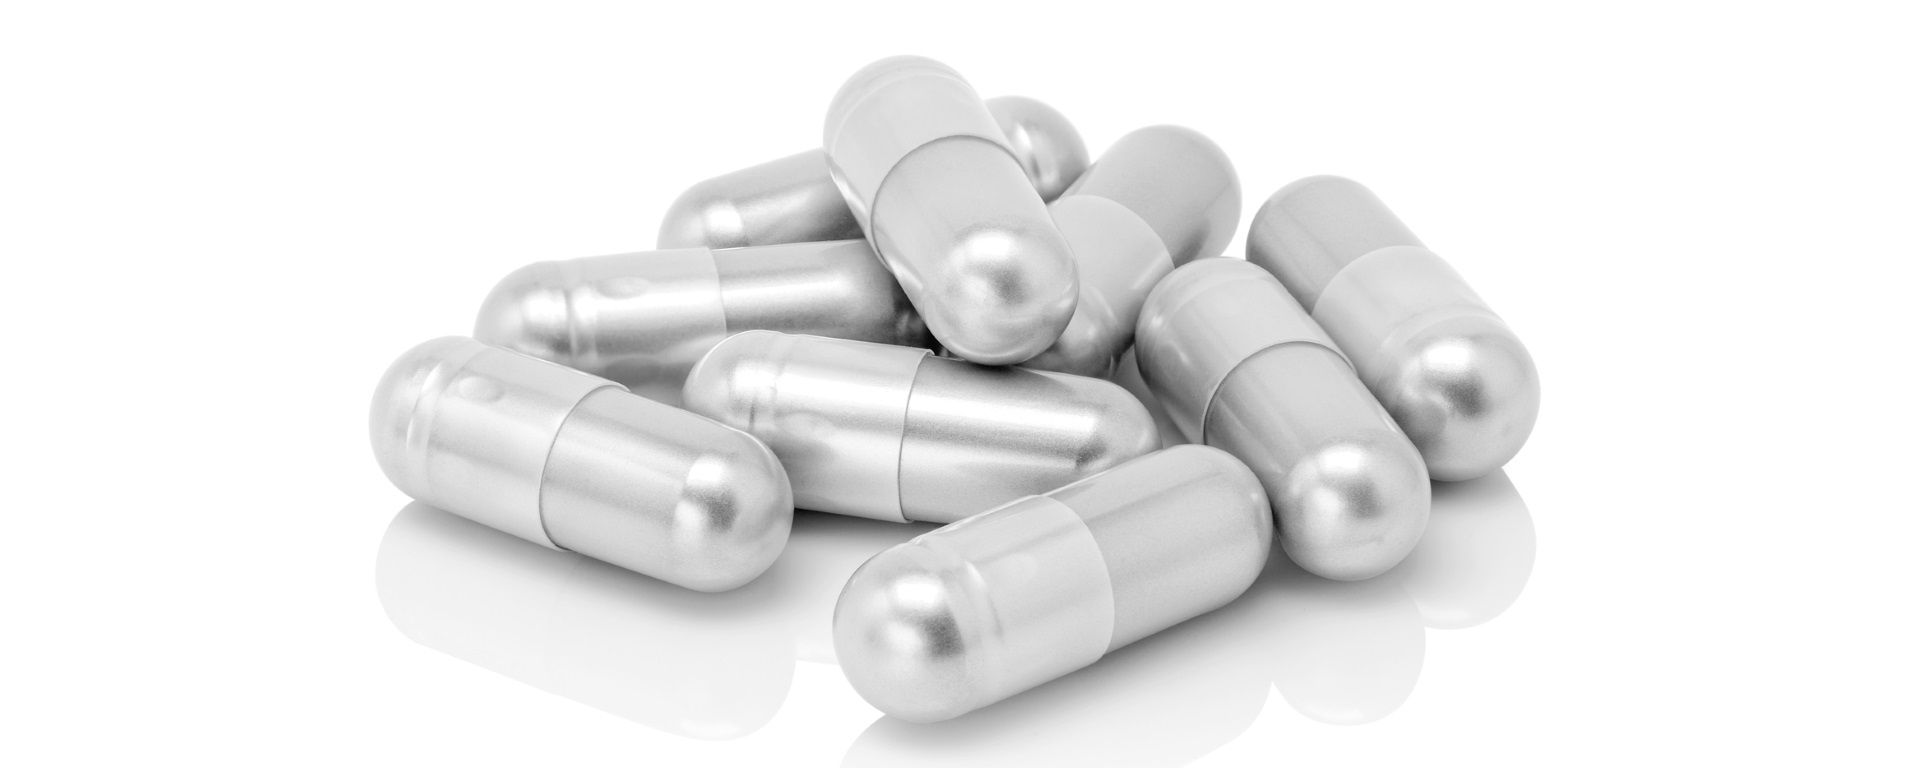 Kolloidales Silber – Wundermittel oder fauler Zauber?